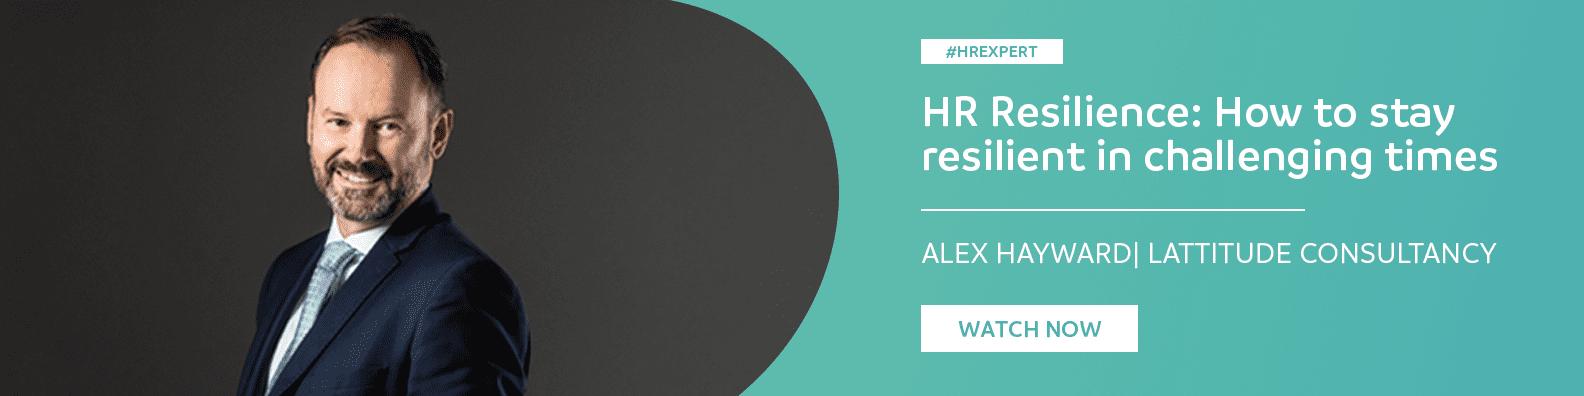 HR Expert Webinar Recording: HR Resilience